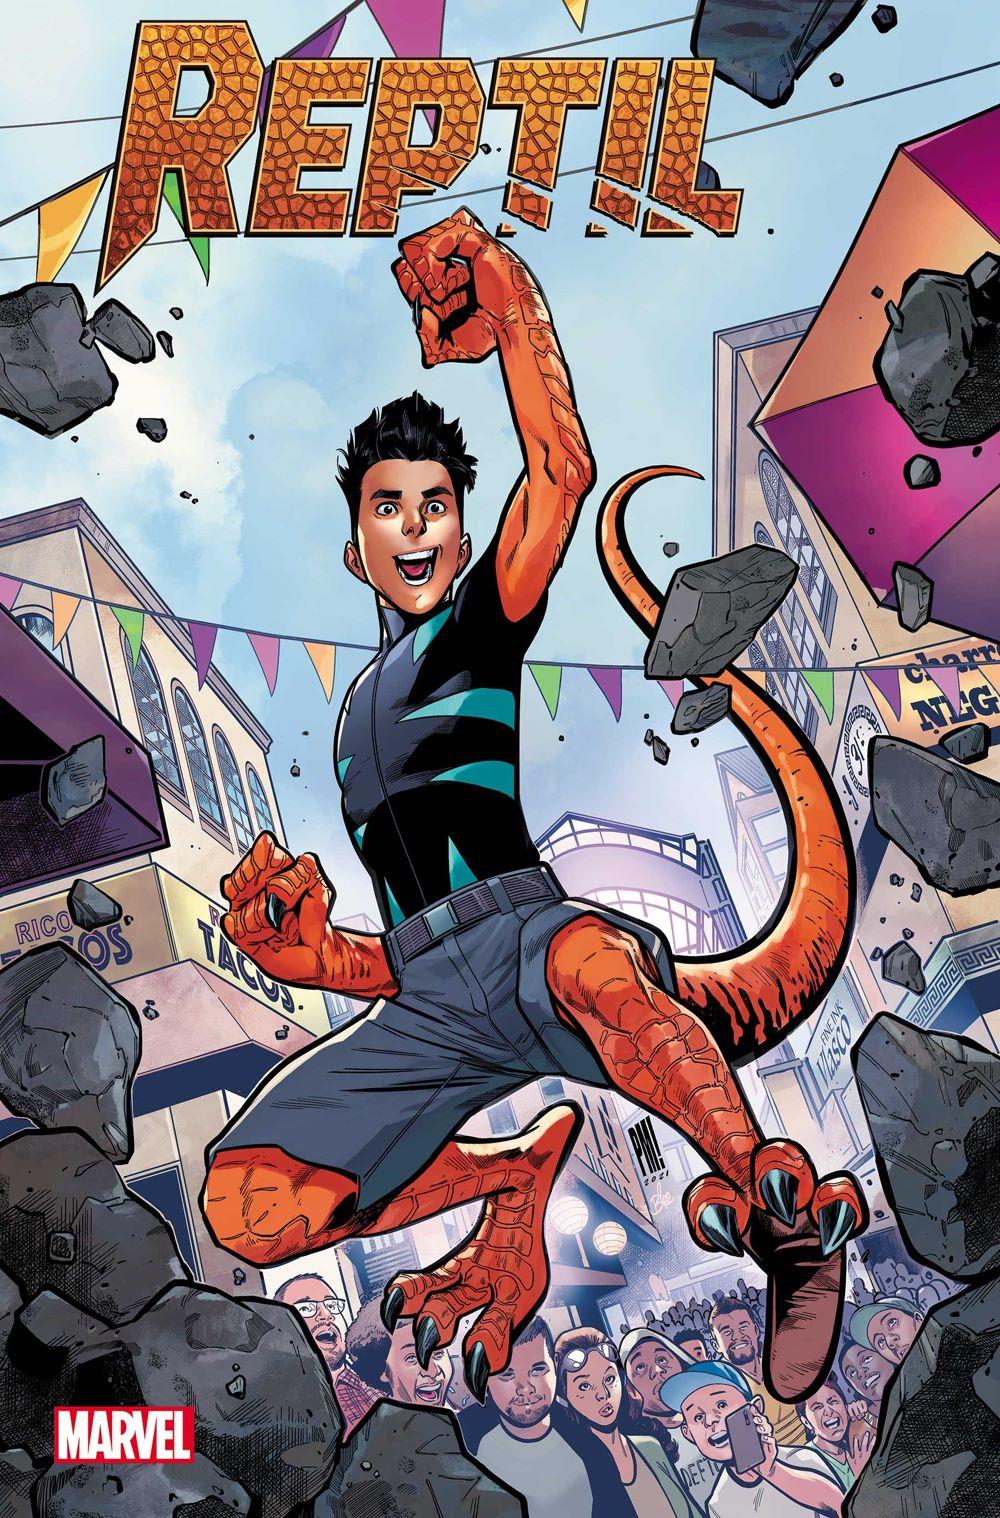 REPTIL2021001_cvr-1 Reptil evolves into his own Marvel Comics limited series